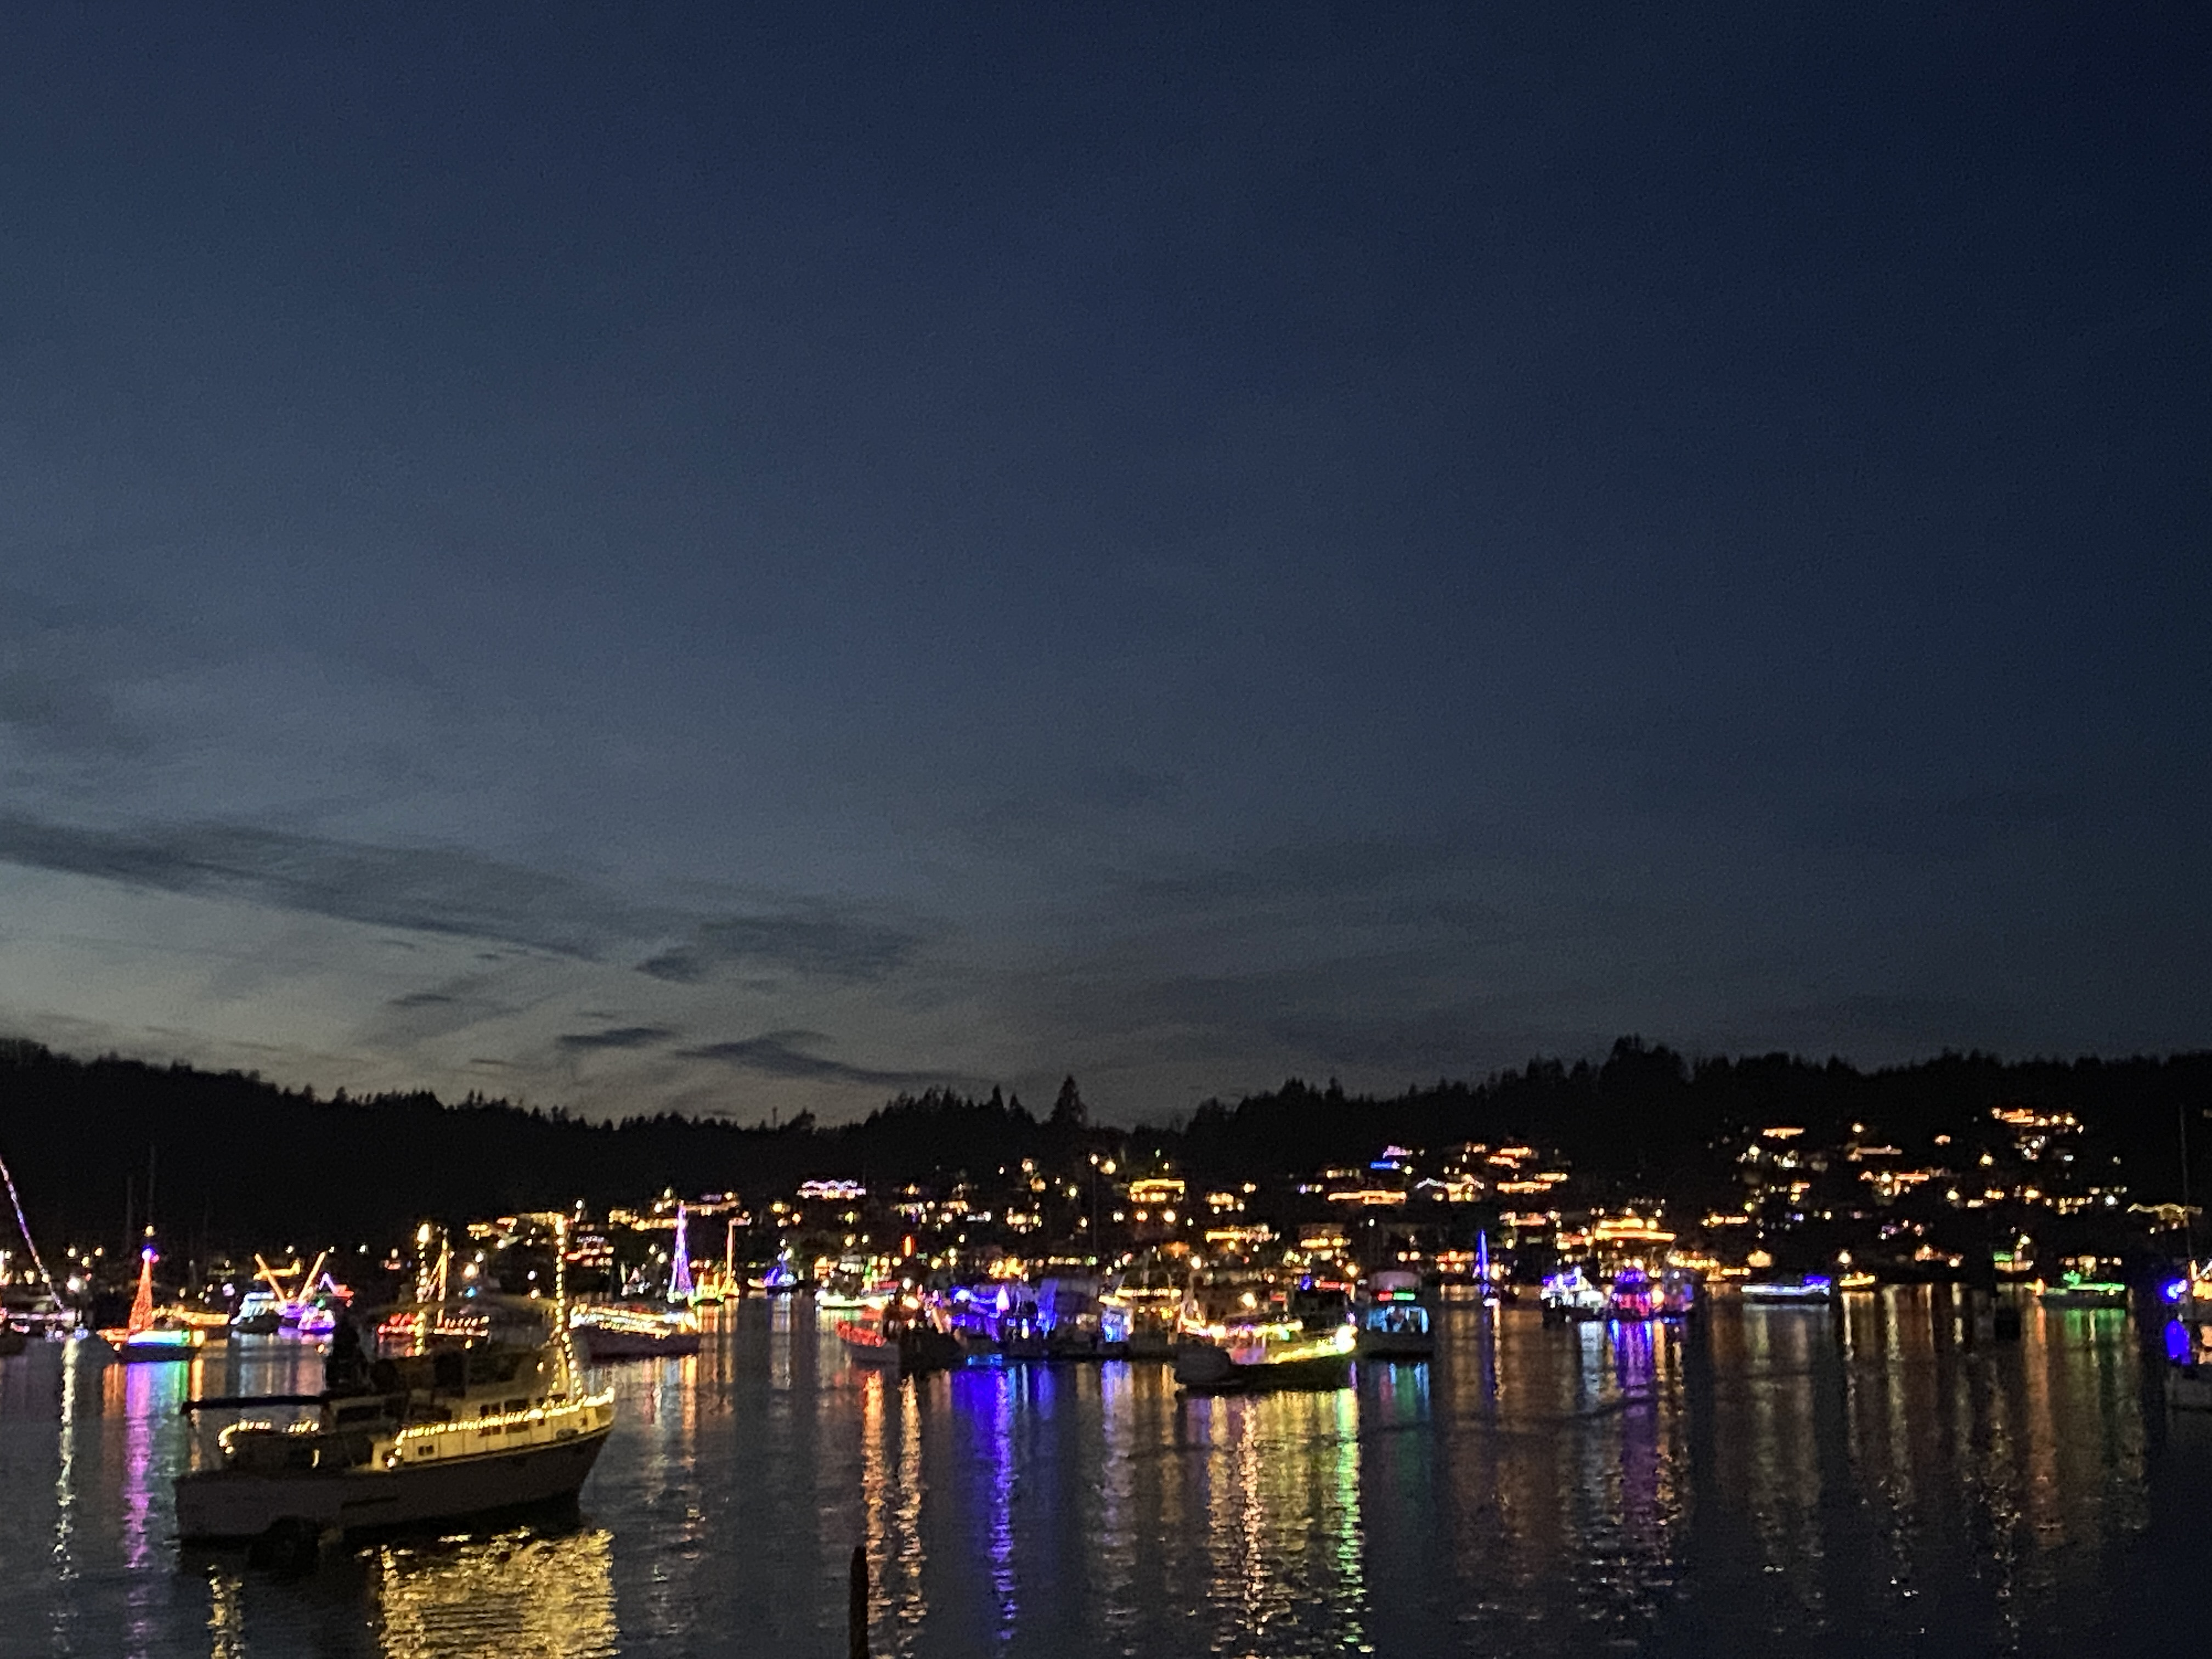 Christmas Boat Parade Gig Harbor 2021 2020 Lighted Boat Parade R Lil Ship